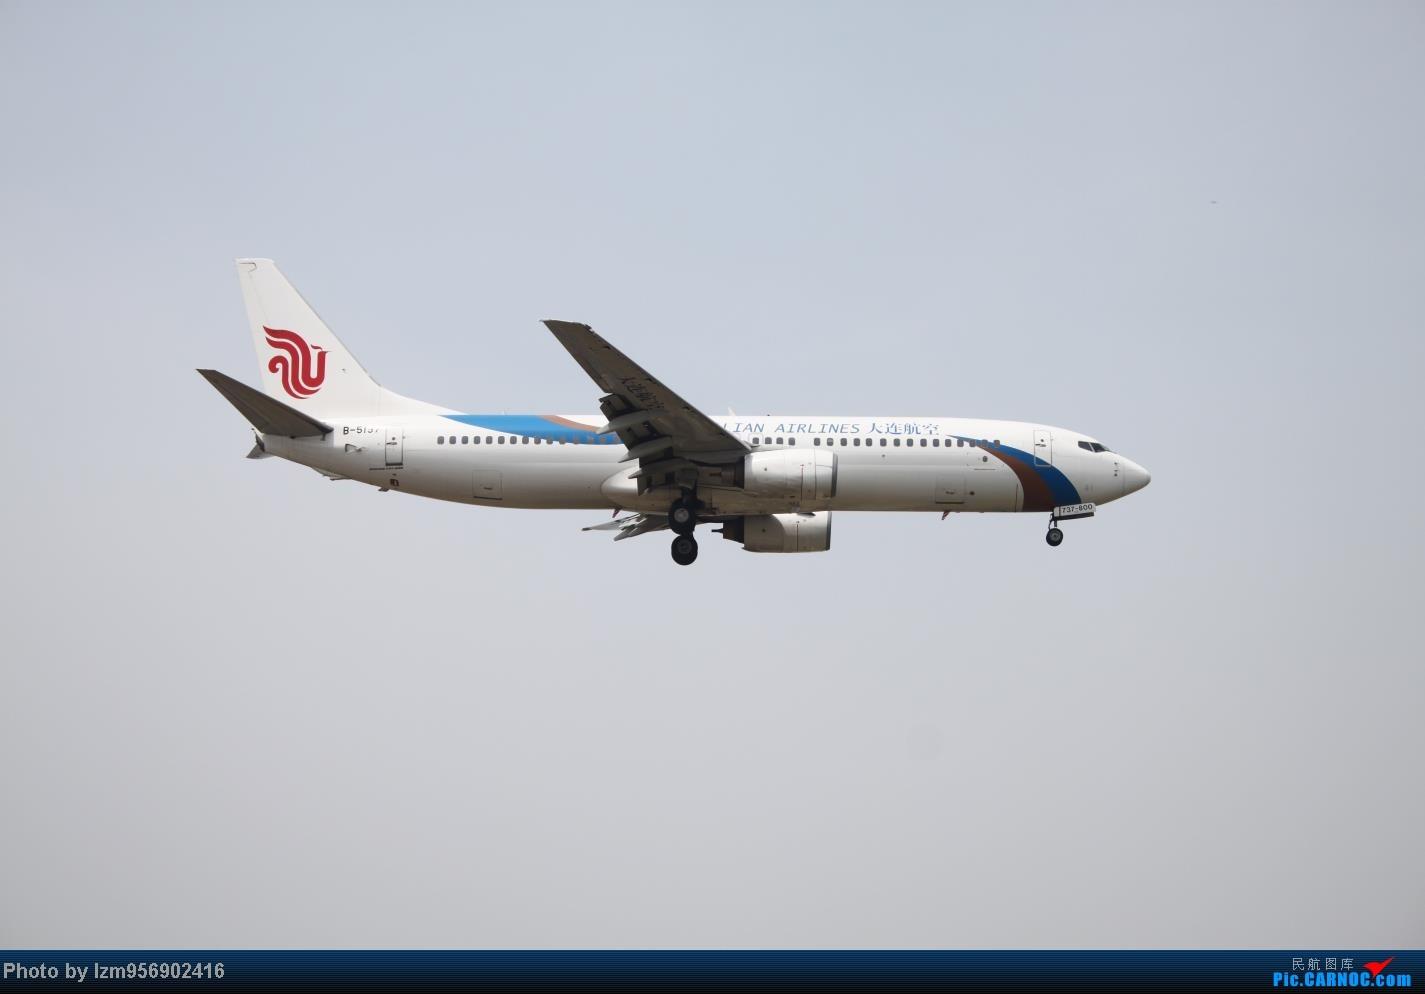 Re:[原创]DLC蹲点大半天,拍到了大棒航空772=w= BOEING 737-800 B-5197 中国大连周水子机场